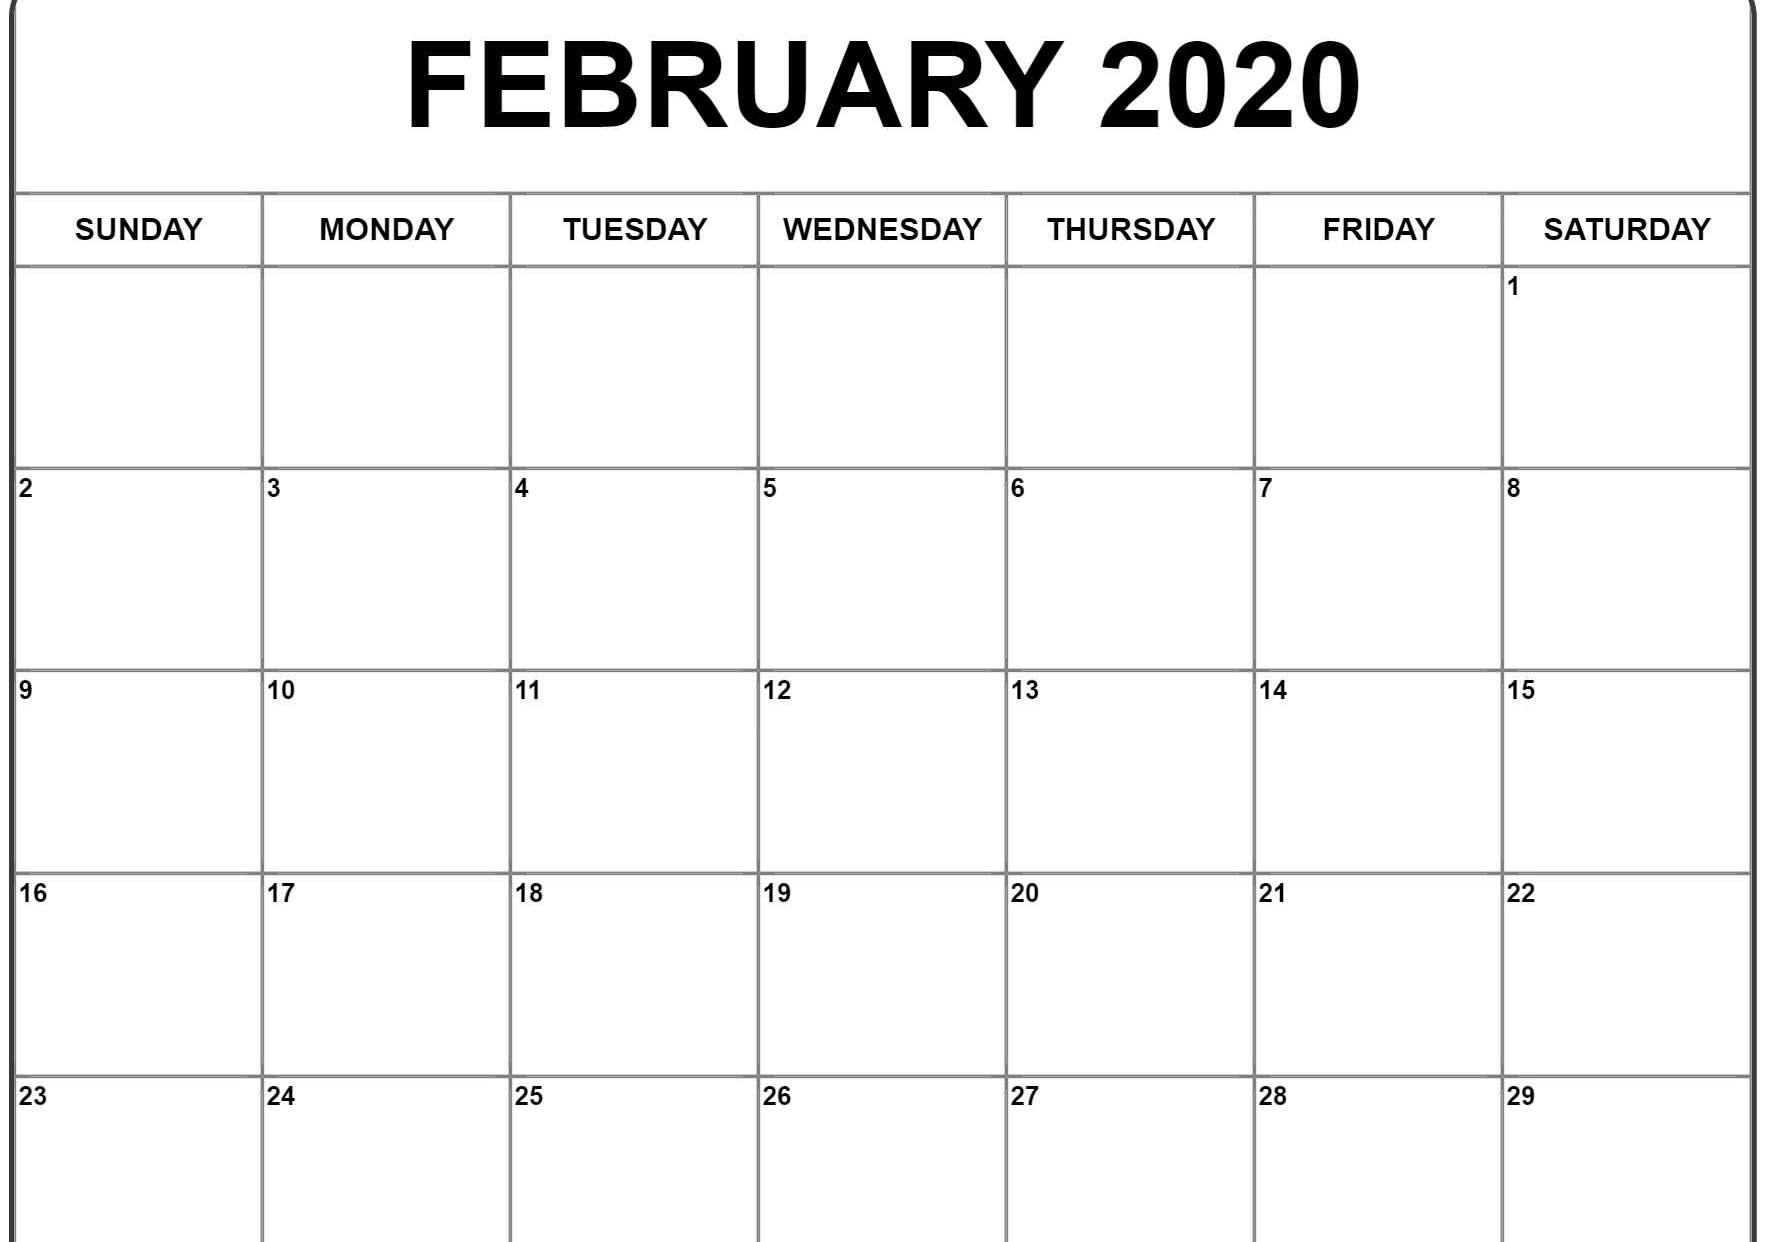 February 2020 Calendar Landscape - Free August 2019 Calendar